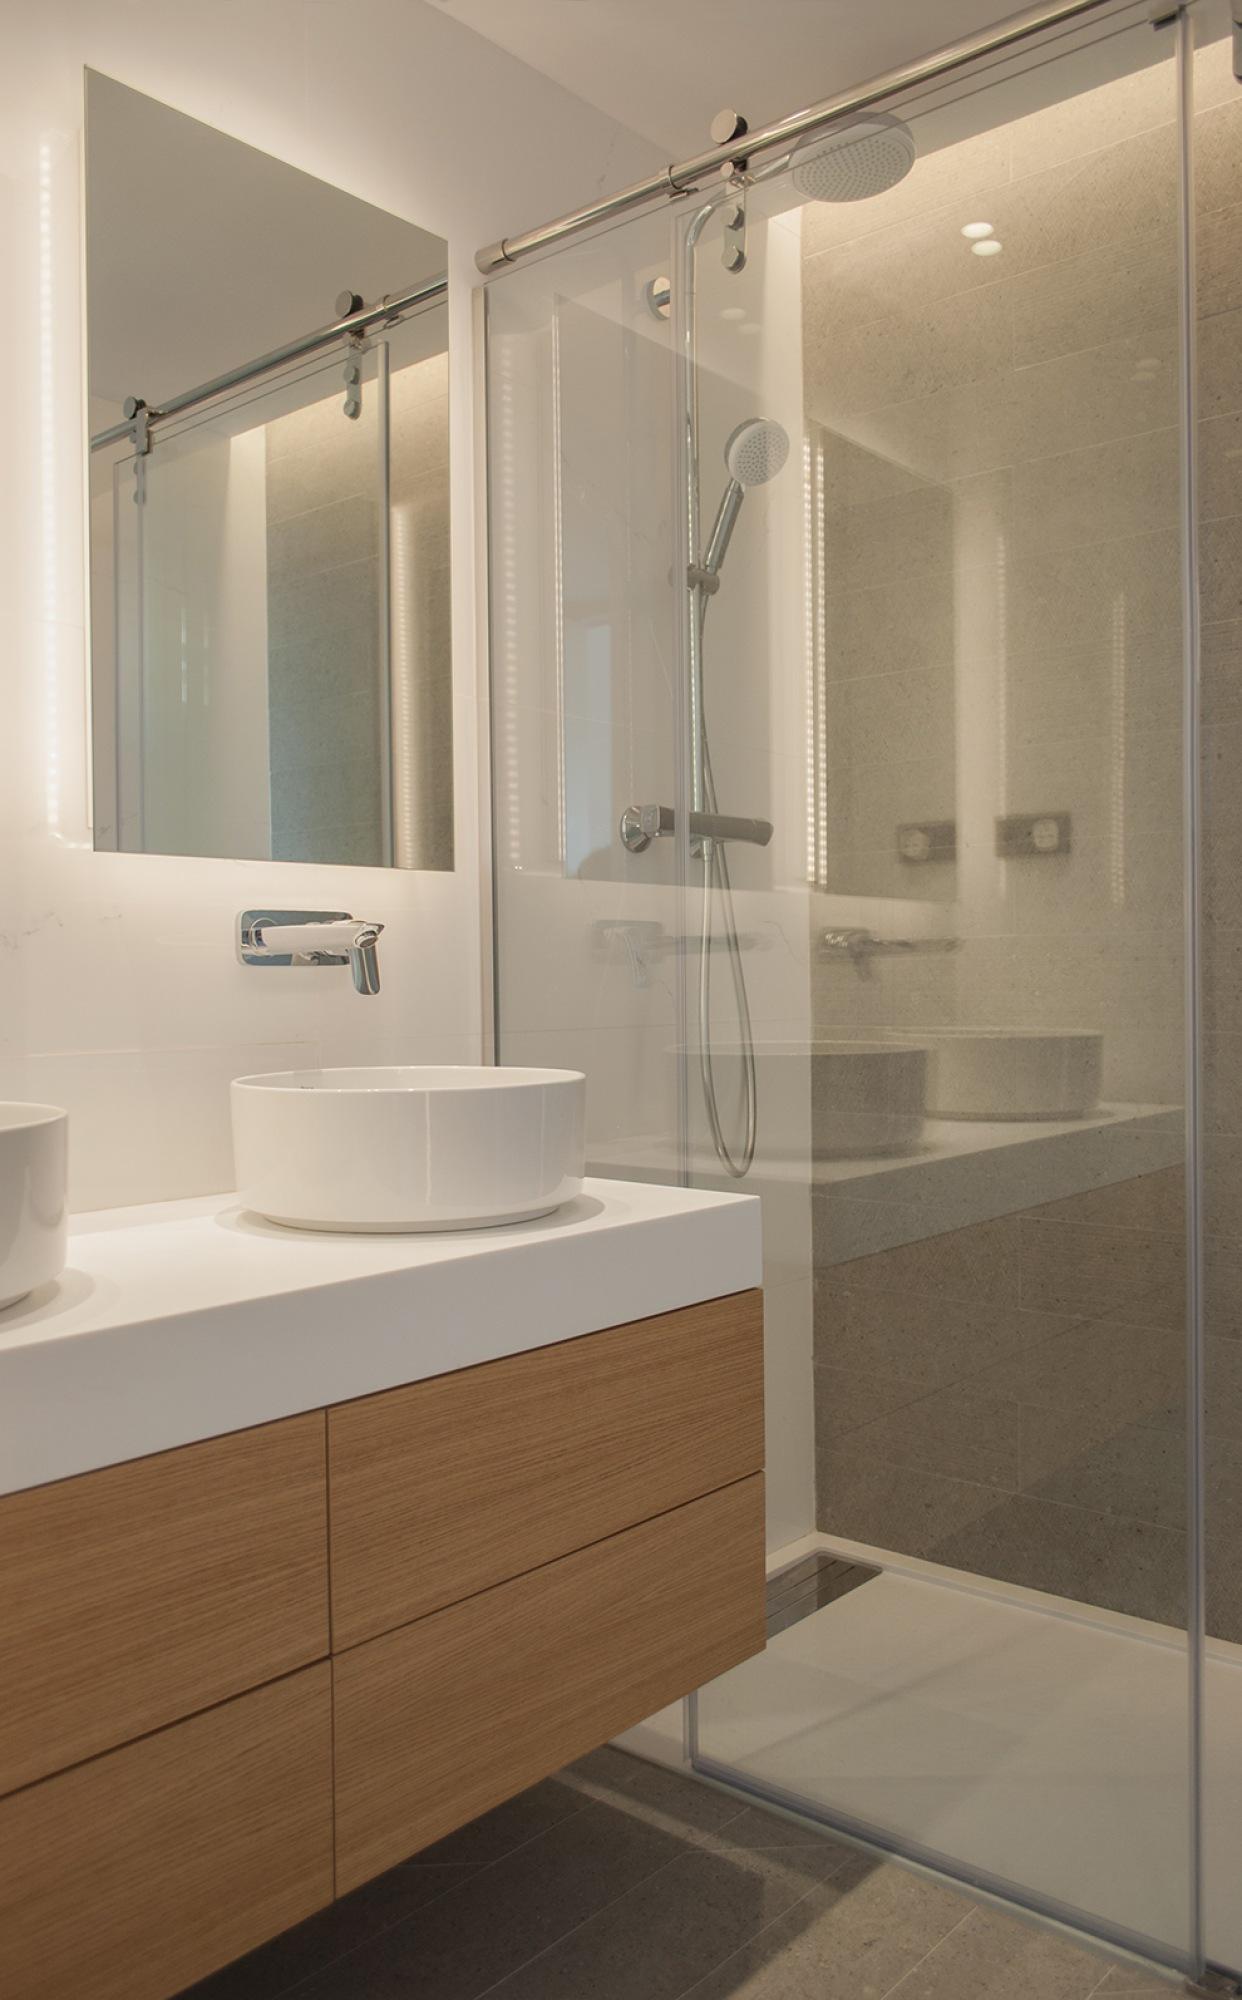 15-13-architecture-sitges-interior-design-barcelona-modern-bathroom-wood-krion-shower